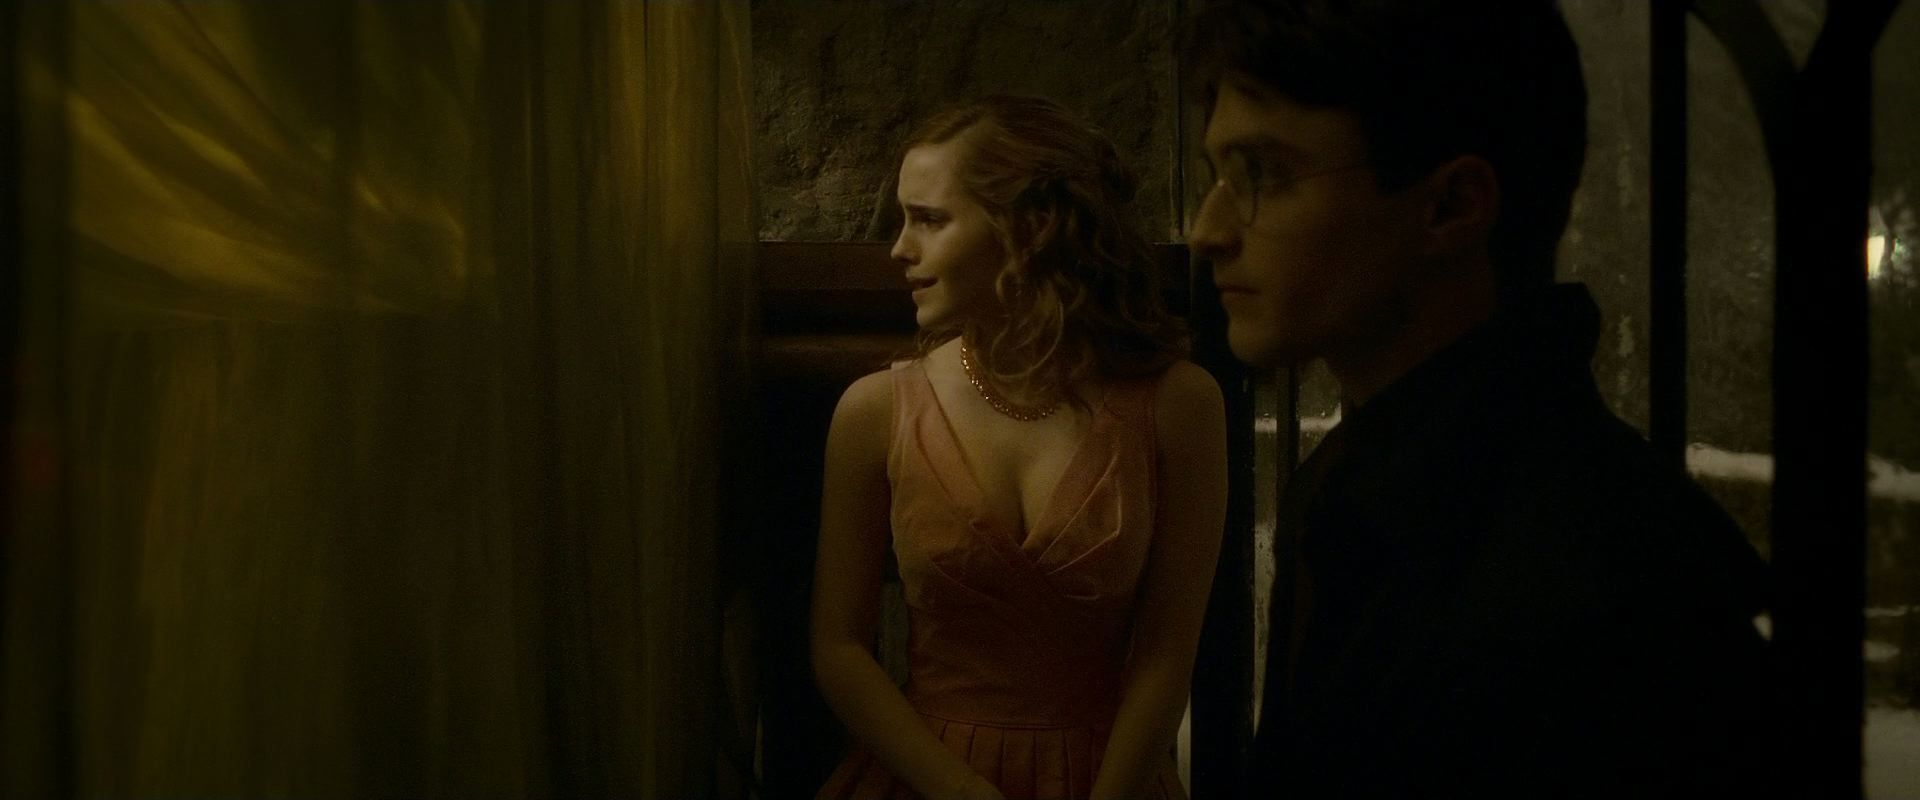 Harry potter half blood prince hermione harmony the half - Hermione granger and the half blood prince ...